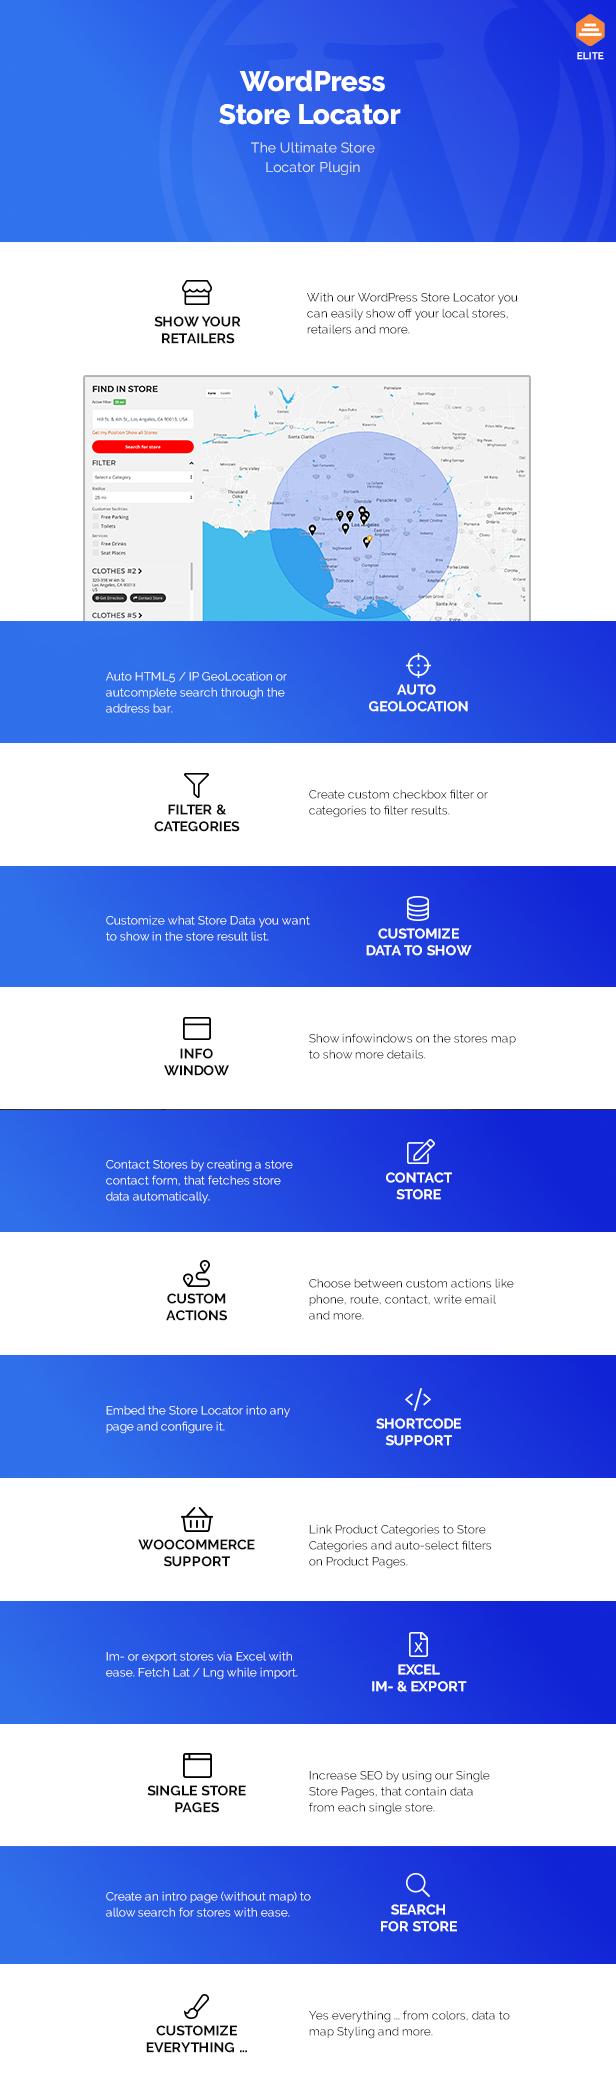 WordPress Store Locator - Features